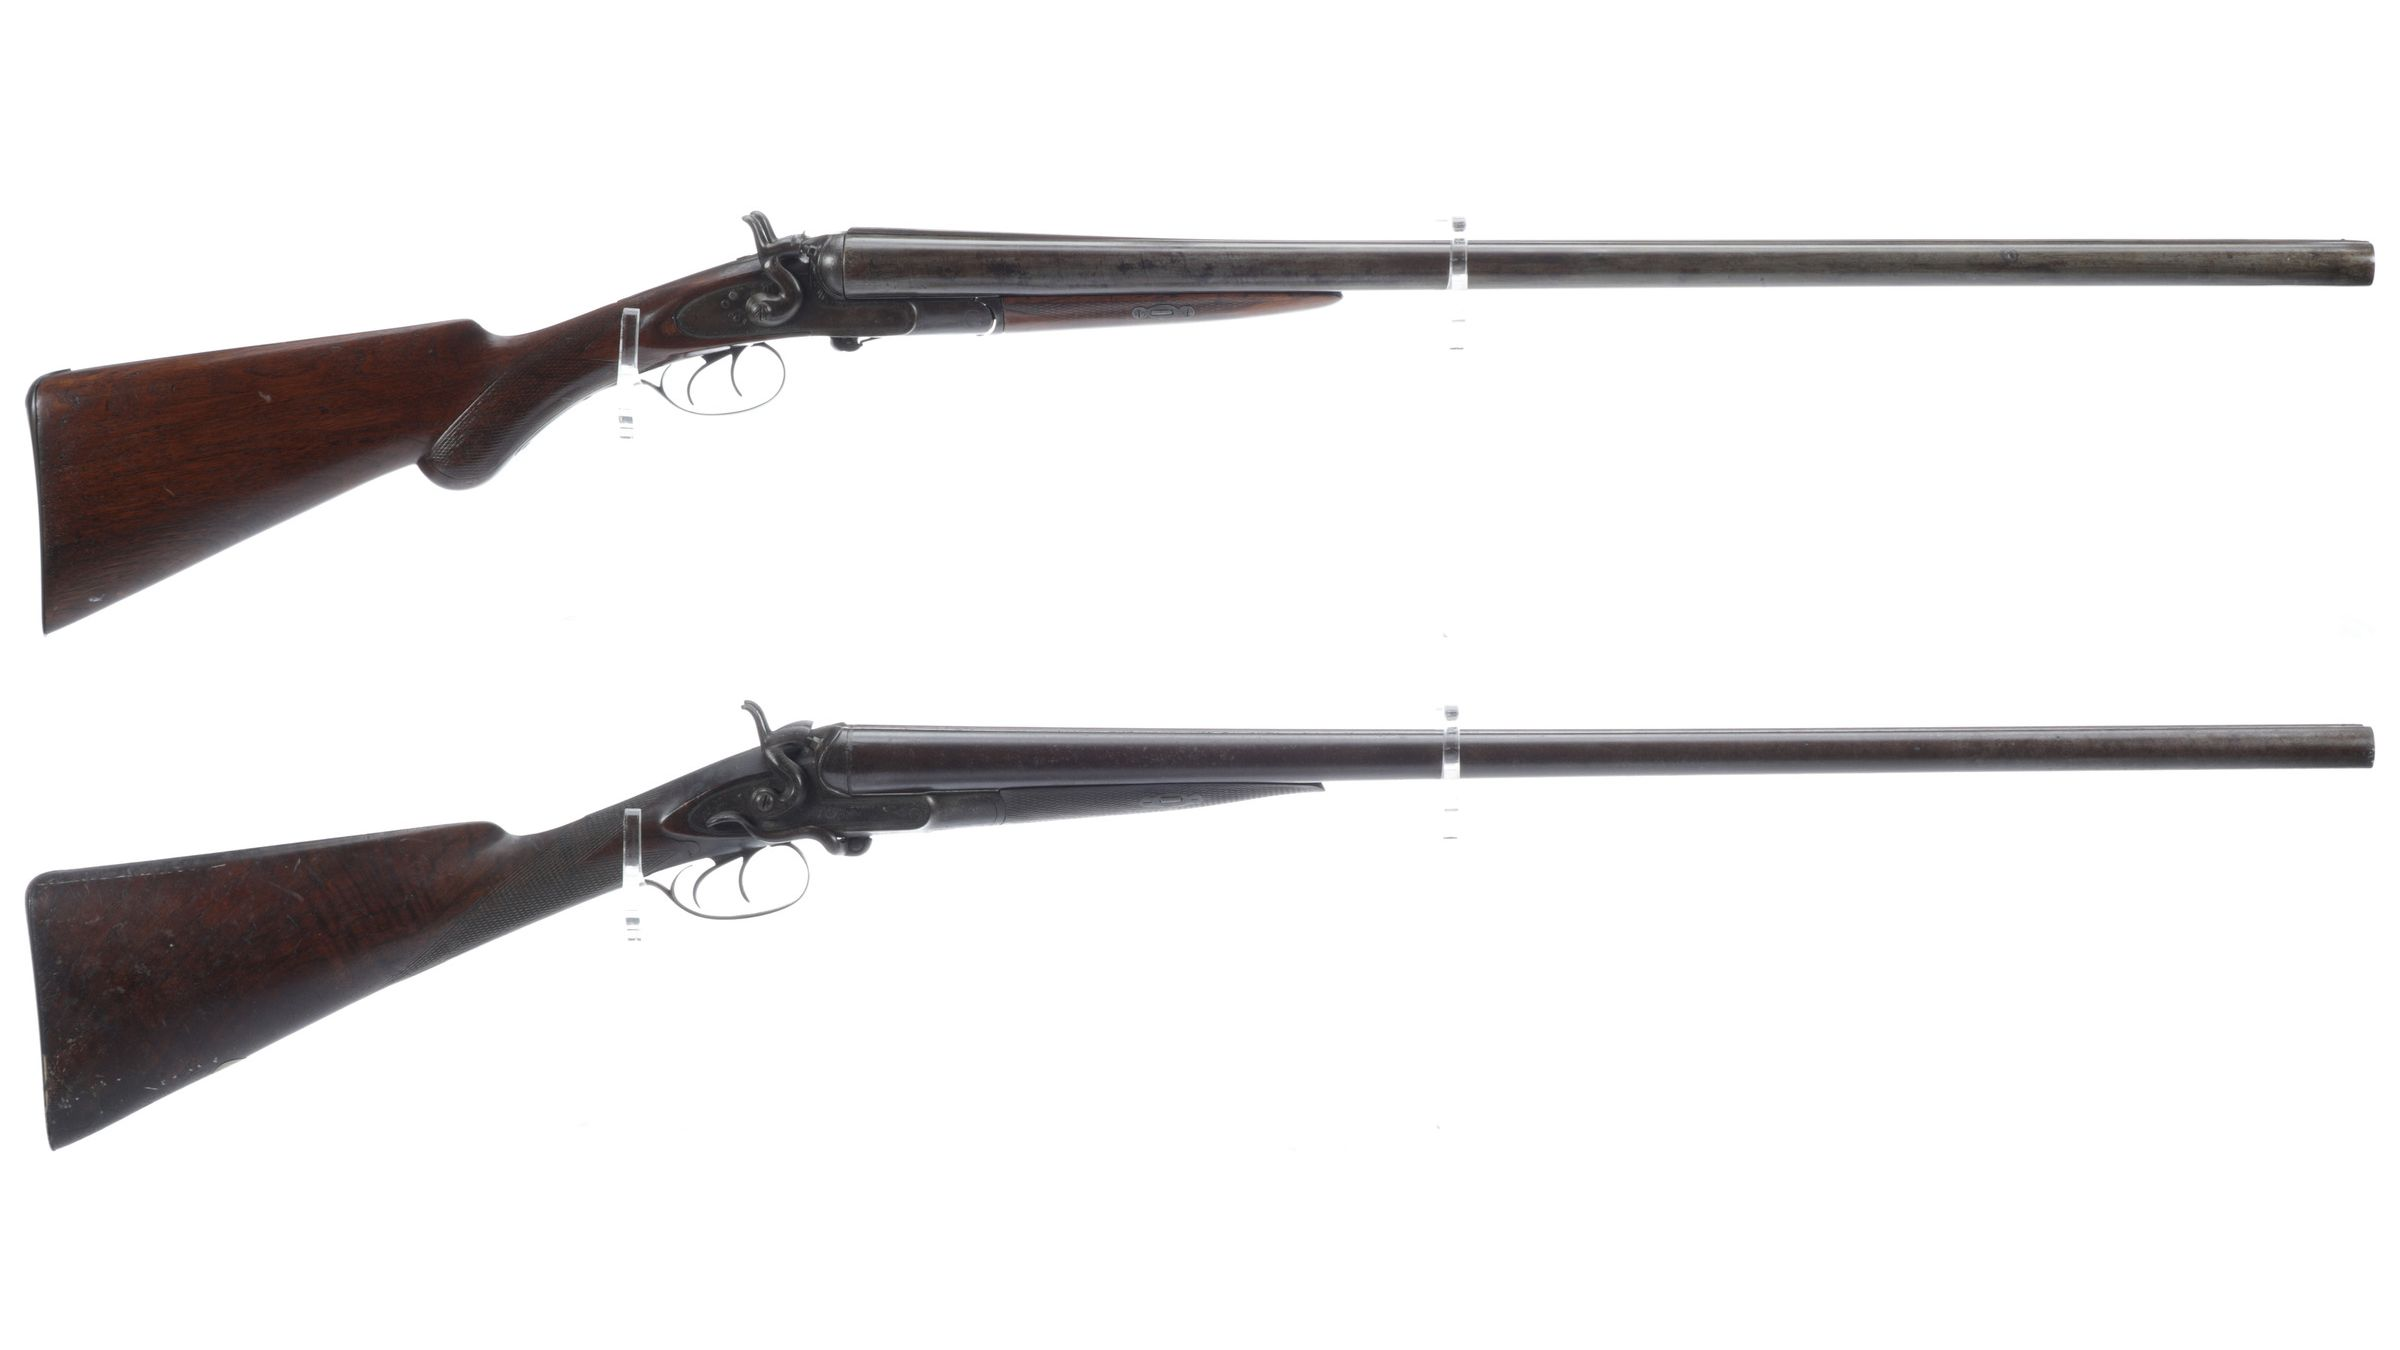 Two Double Barrel Shotguns